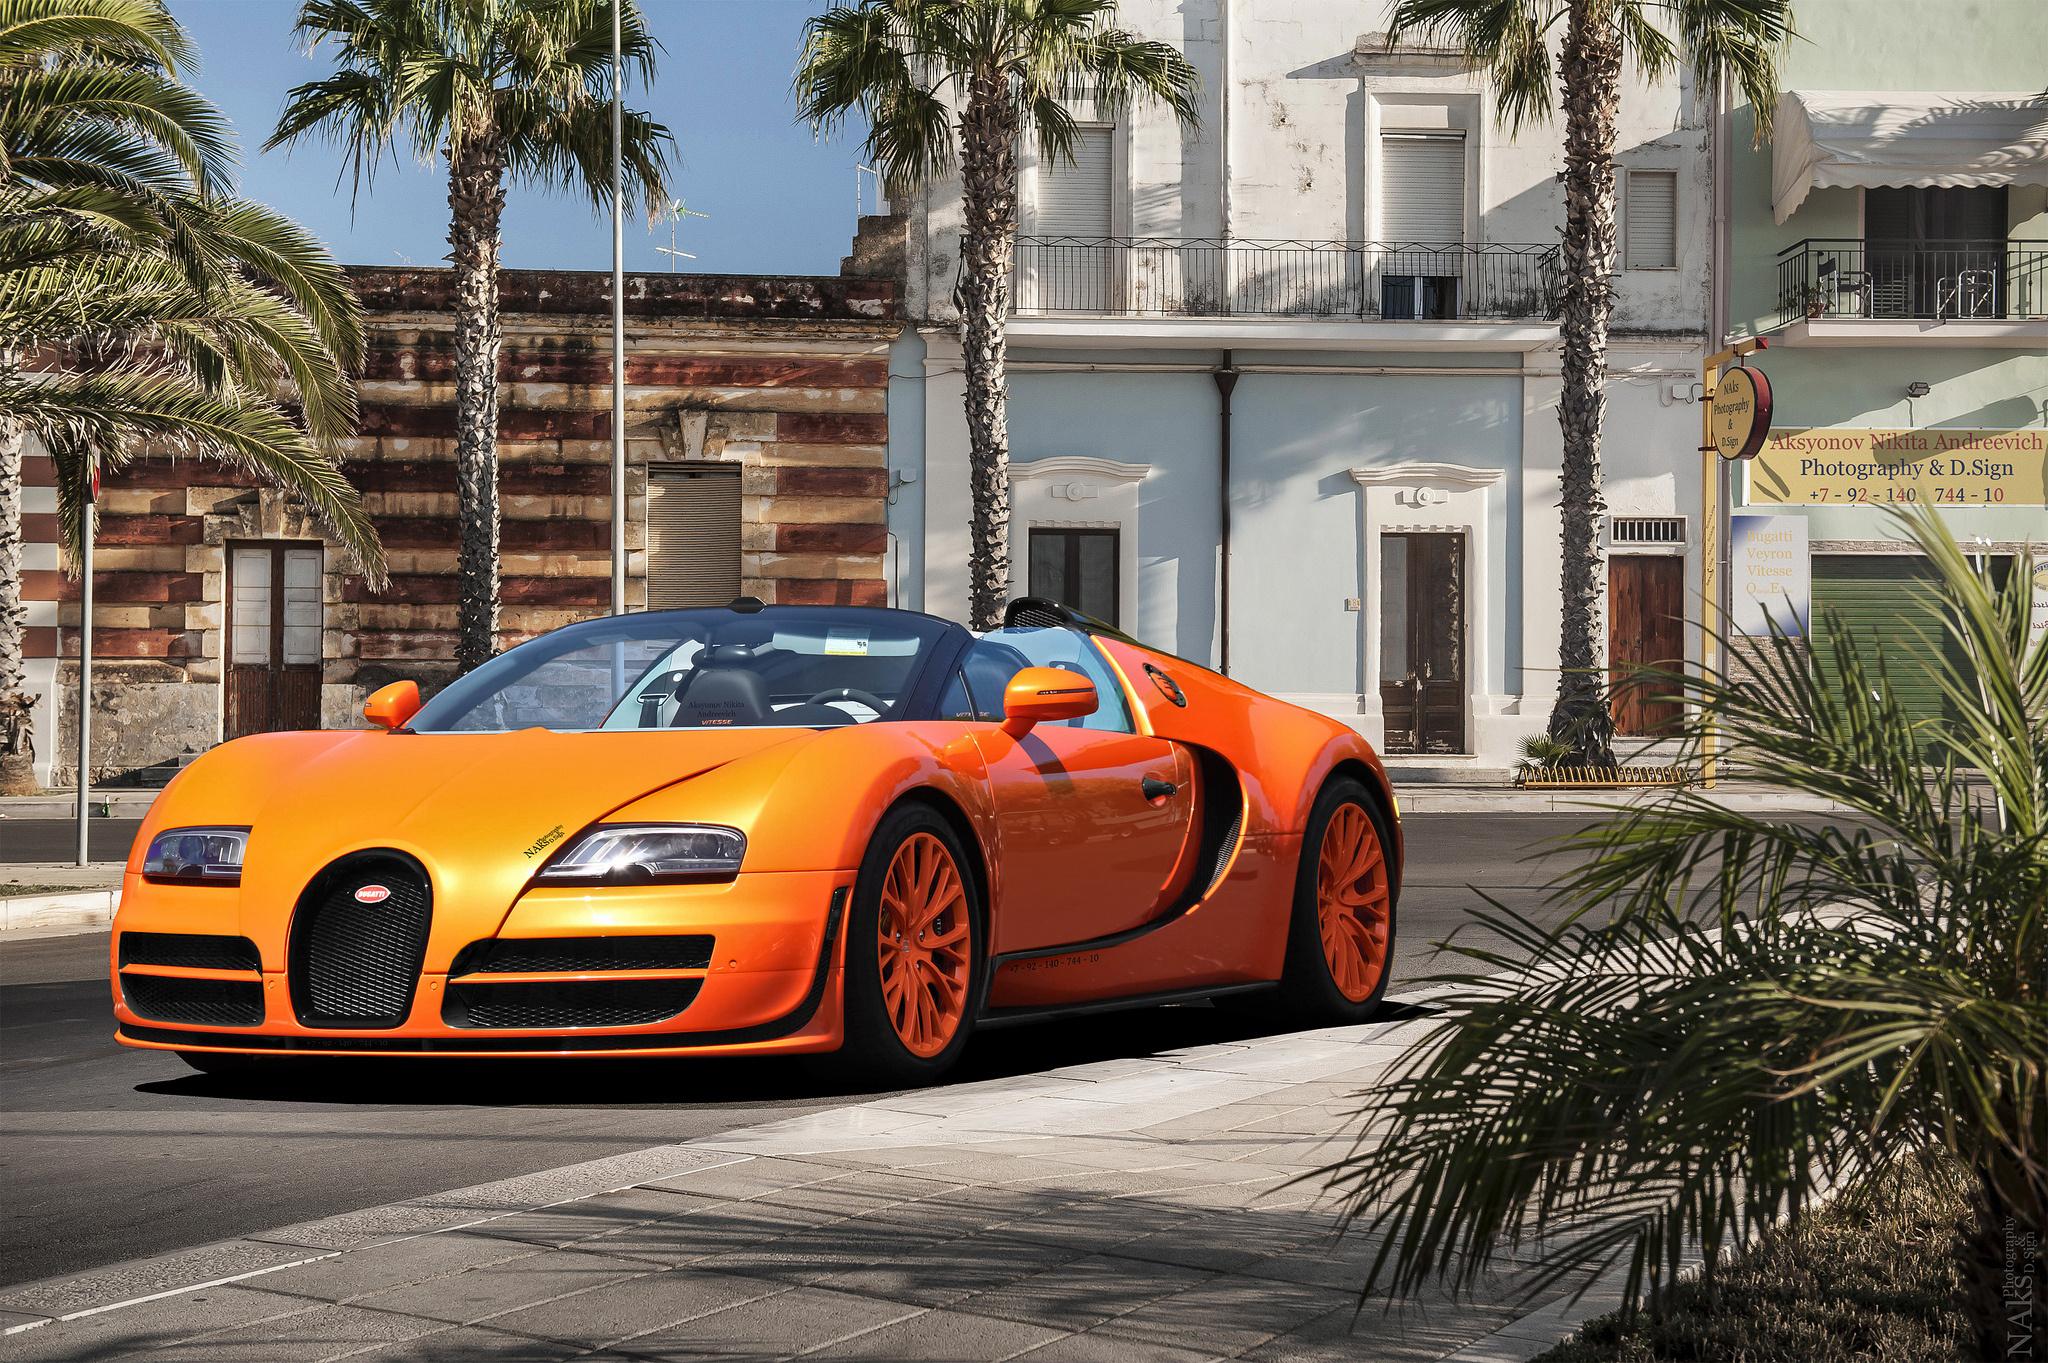 155300 скачать обои Бугатти (Bugatti), Тачки (Cars), Veyron, Vitesse, Гиеркар - заставки и картинки бесплатно